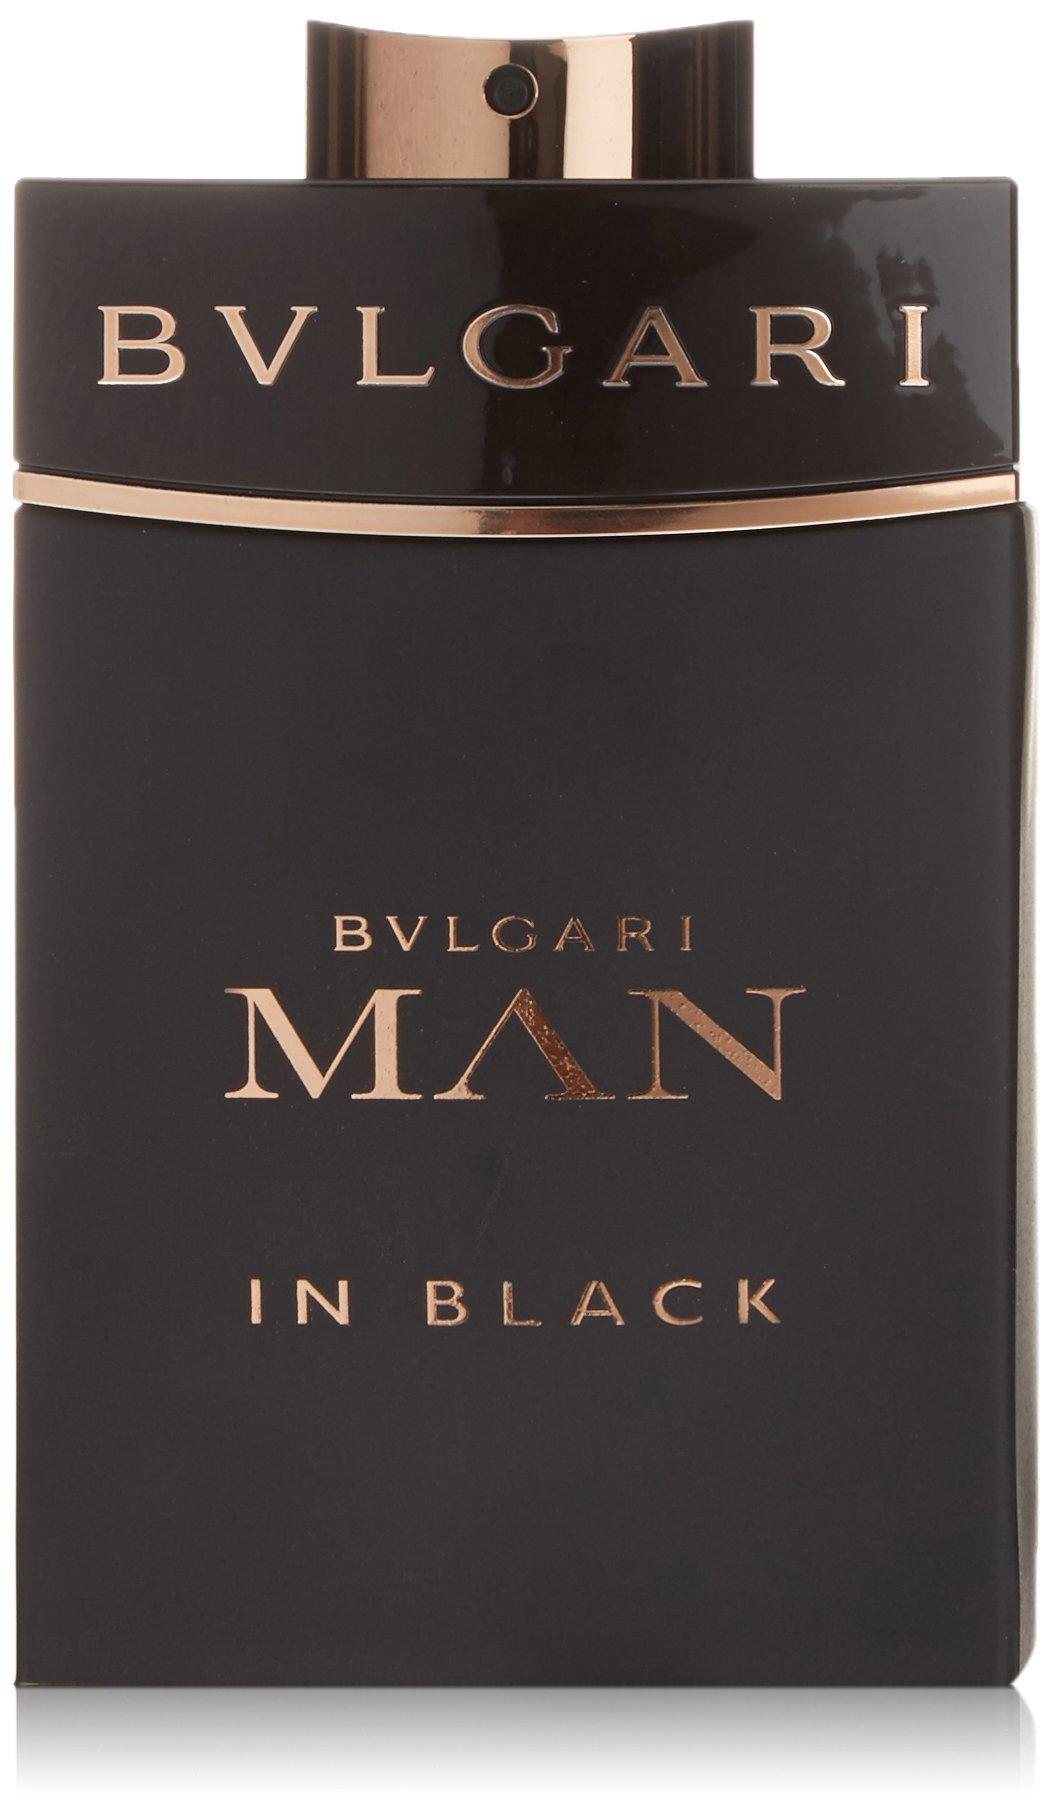 BVLGARI Man In Black Eau de Parfum Spray, 5 Fluid Ounce